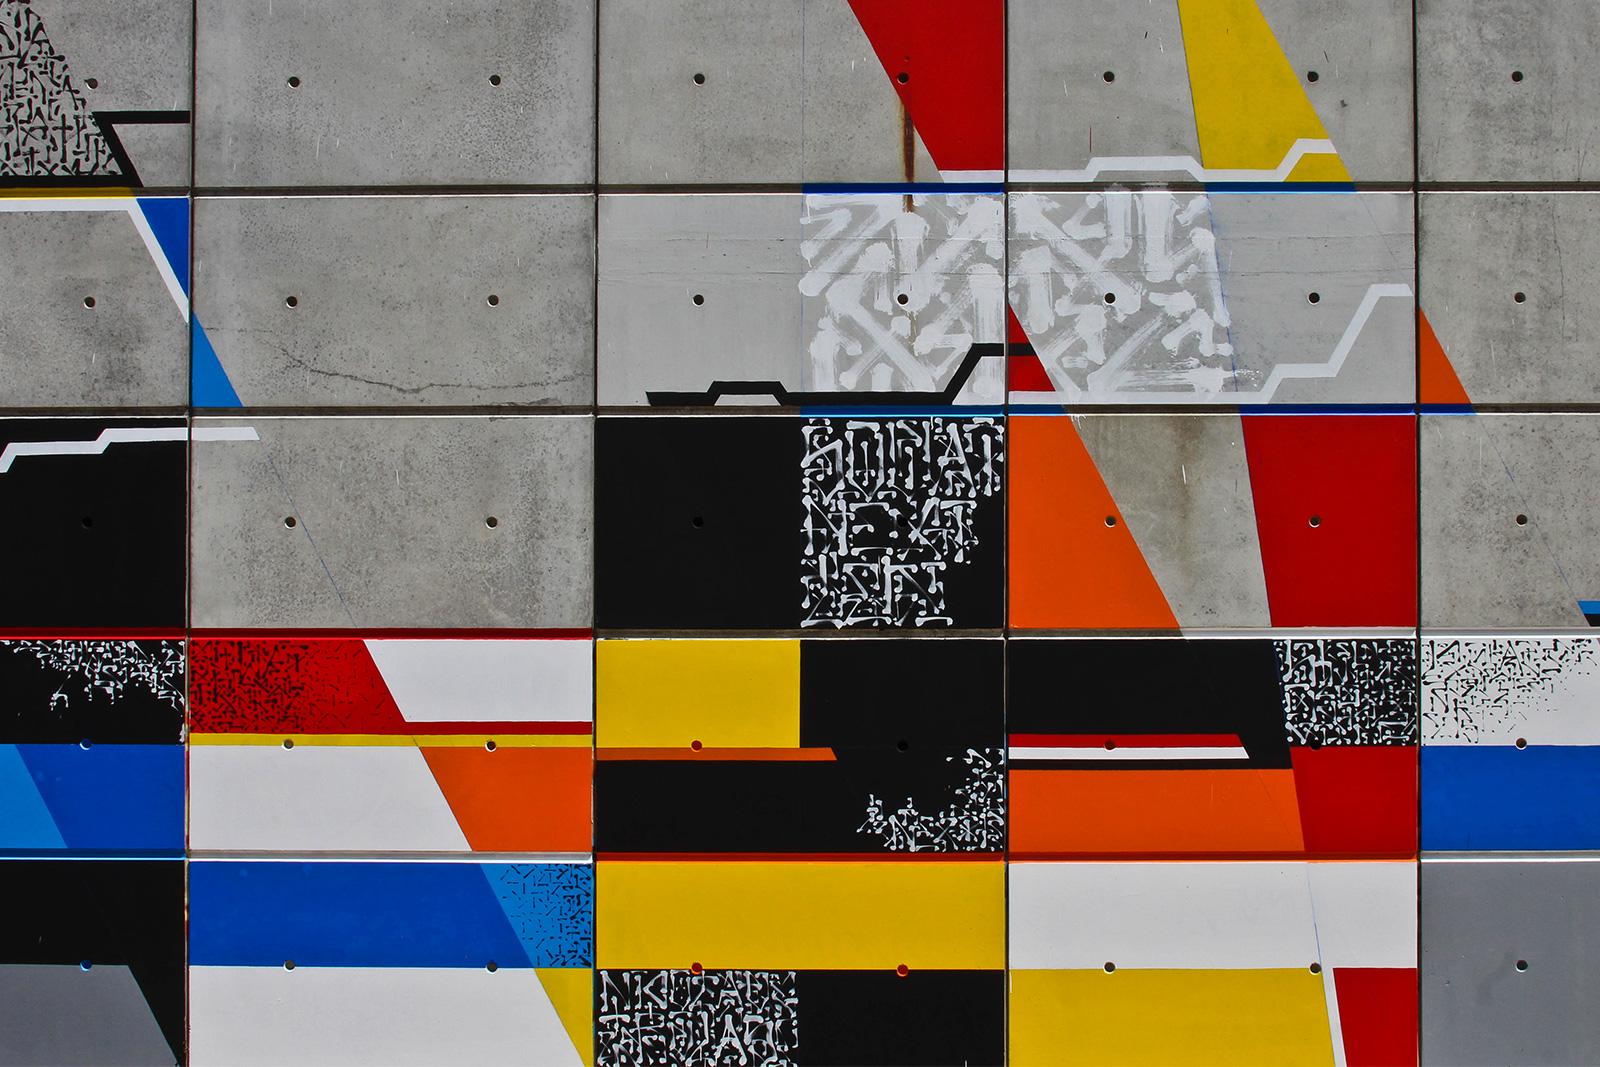 Lek-Sowat-DMV-da-mental-vaporz-graffiti-soldart-montana-bombe-spray-evry-paris-mur-peinture-nicolas-gzeley-13